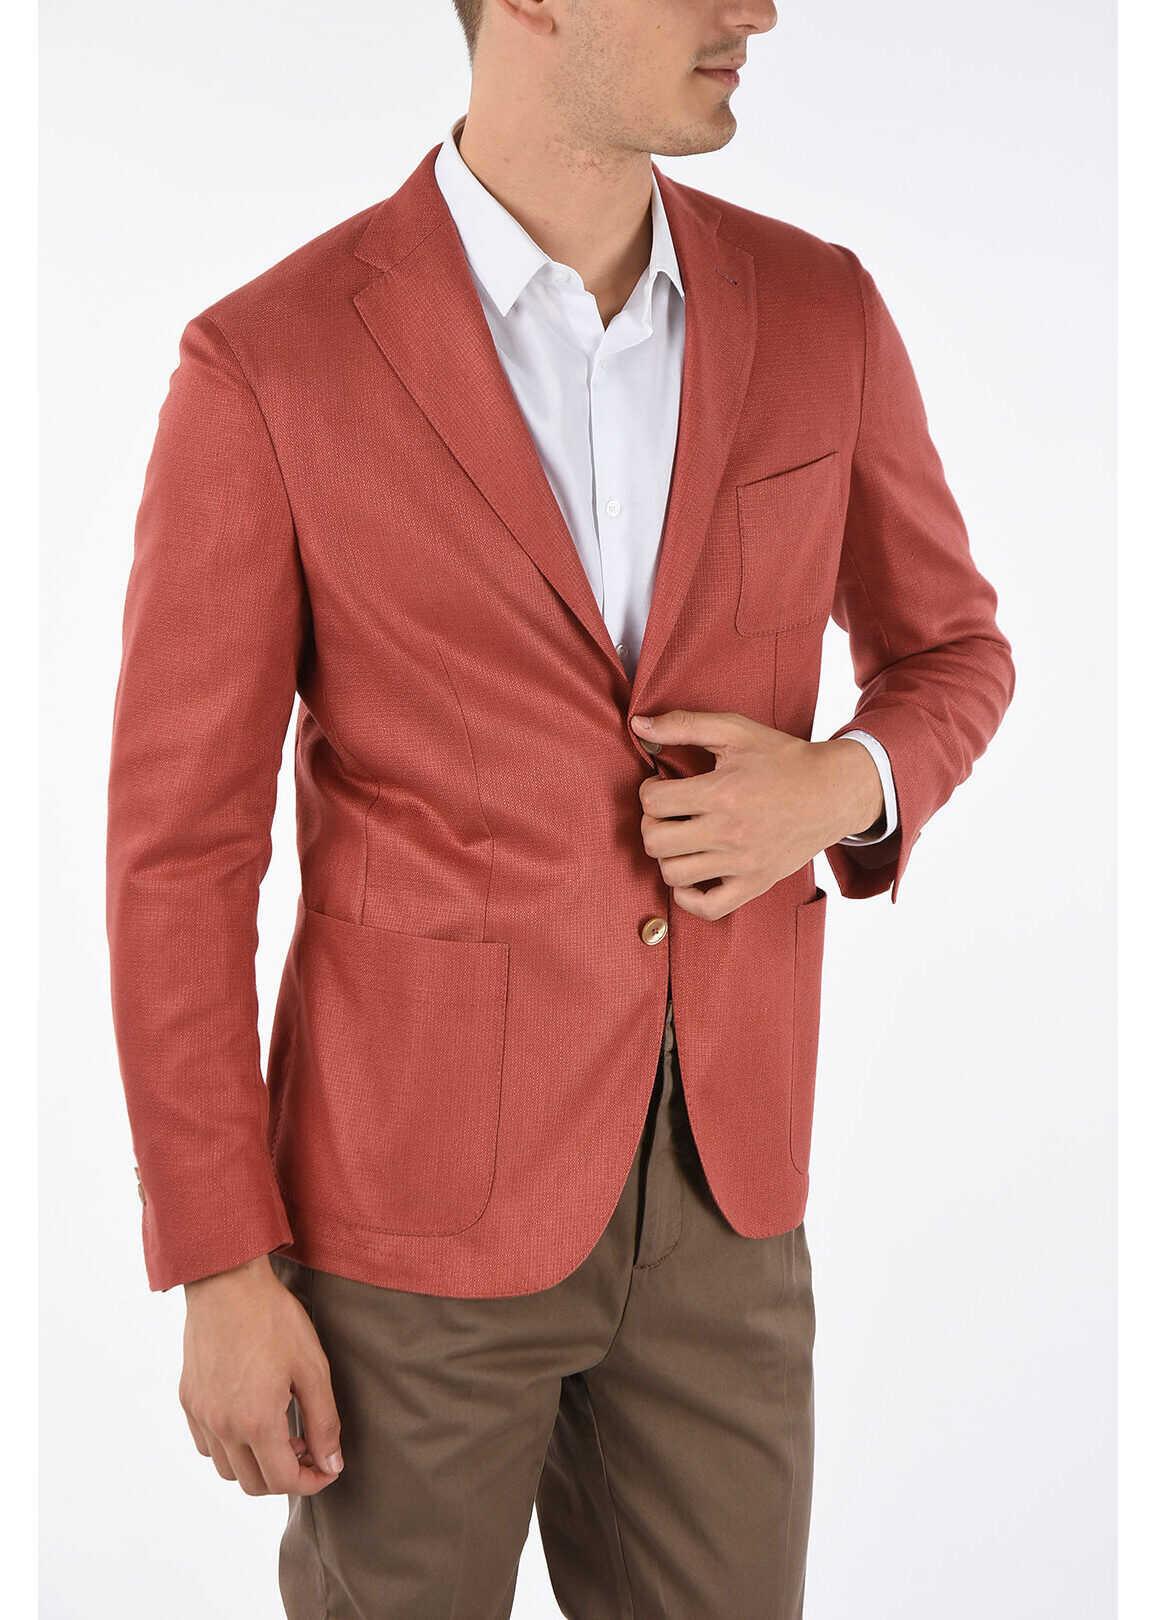 CORNELIANI ID silk IDENTITY 2-button blazer RED imagine